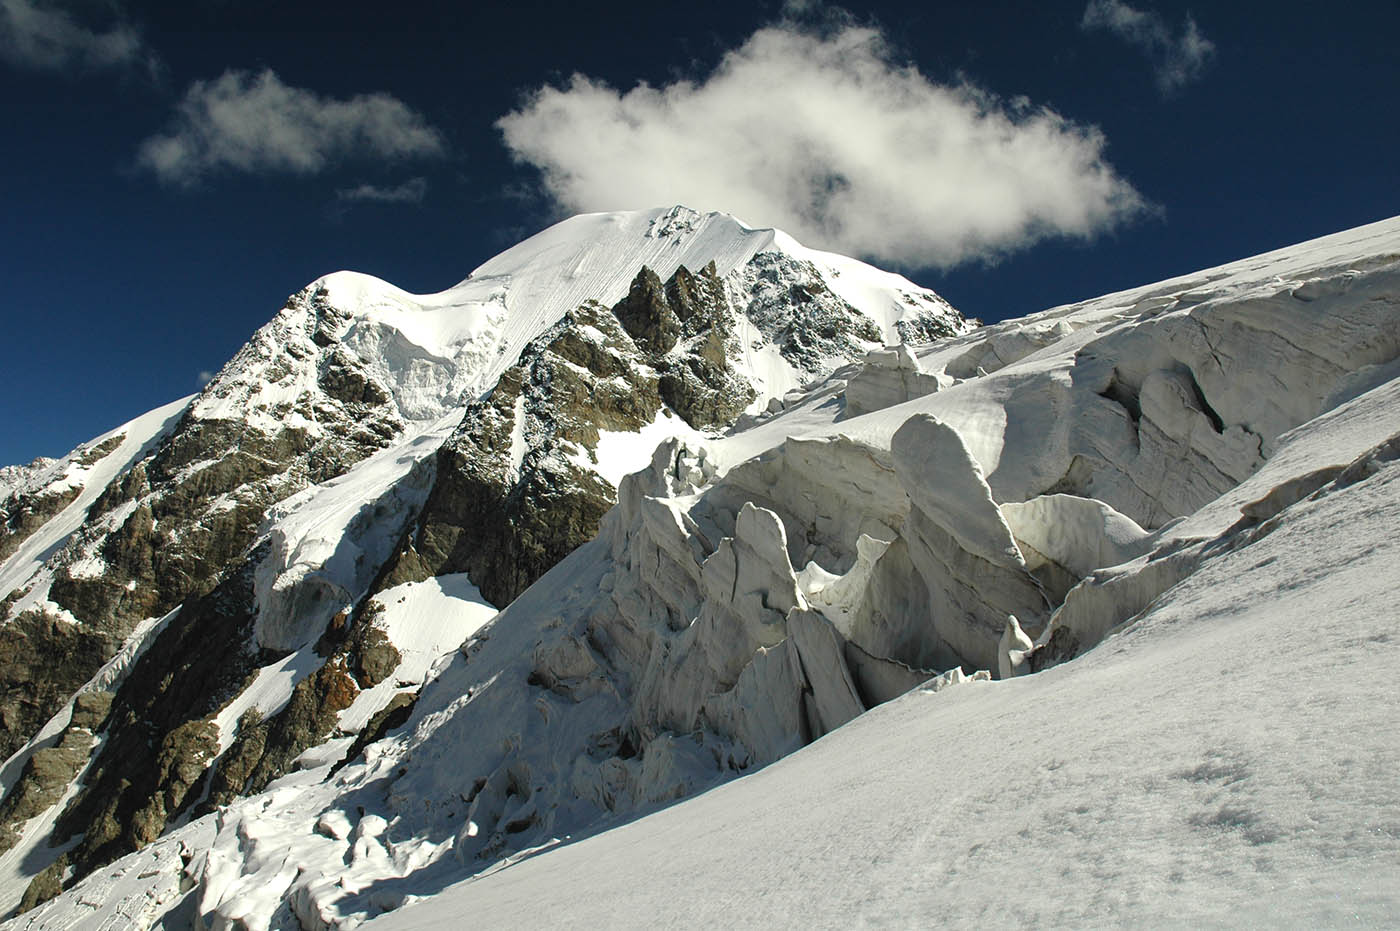 фото_106_день_11_сераки на леднике.jpg